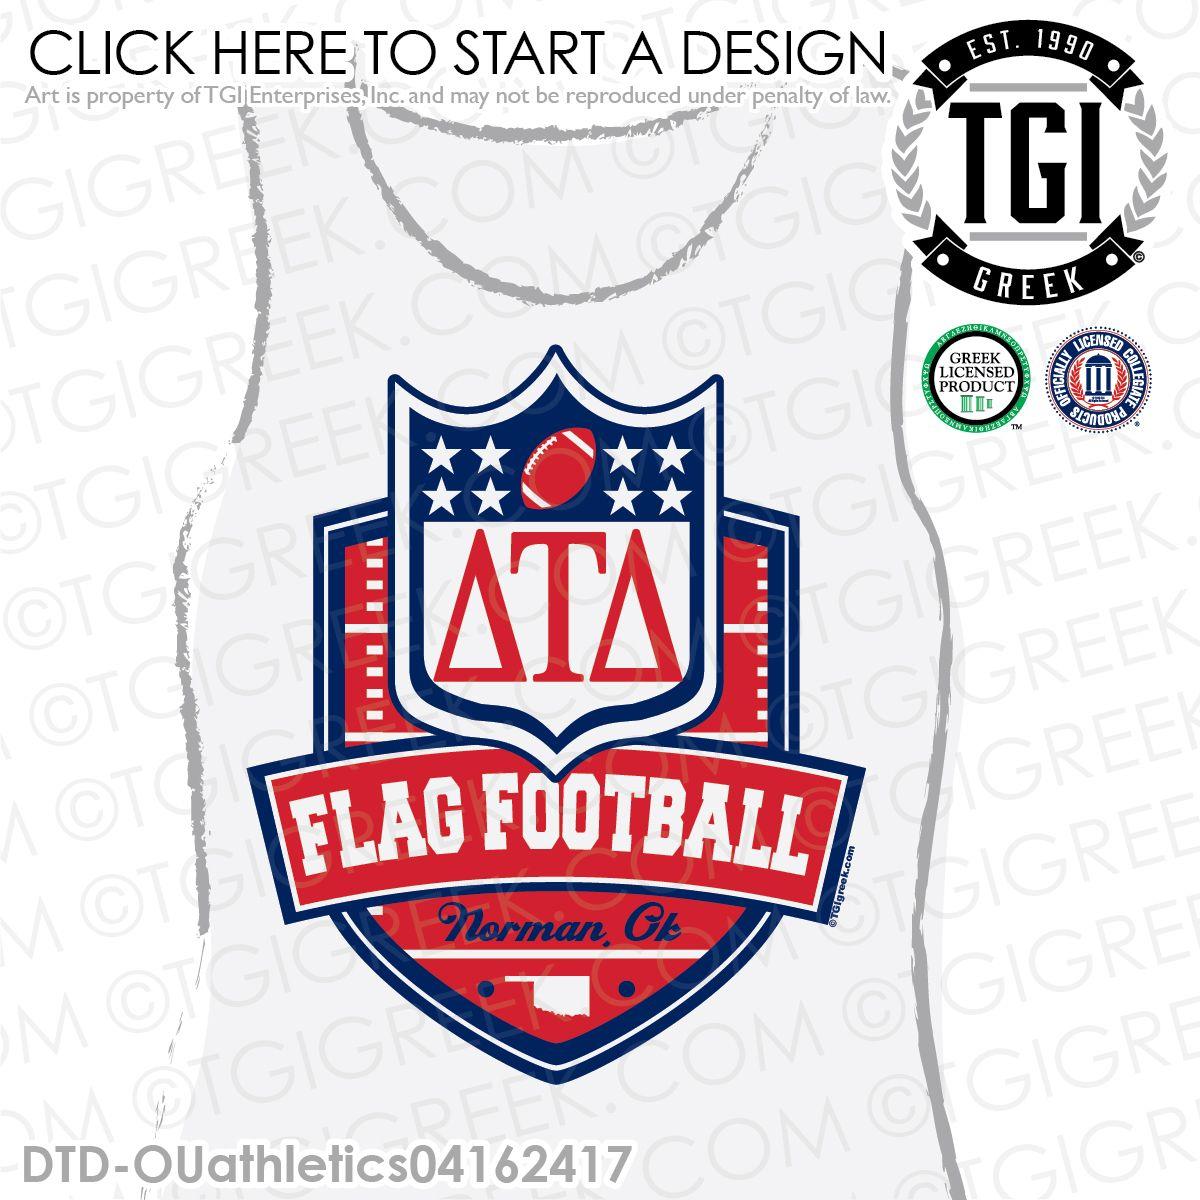 a30ecb32d TGI Greek - Delta Tau Delta - Flag Football - Greek Apparel  tgigreek   deltataudelta